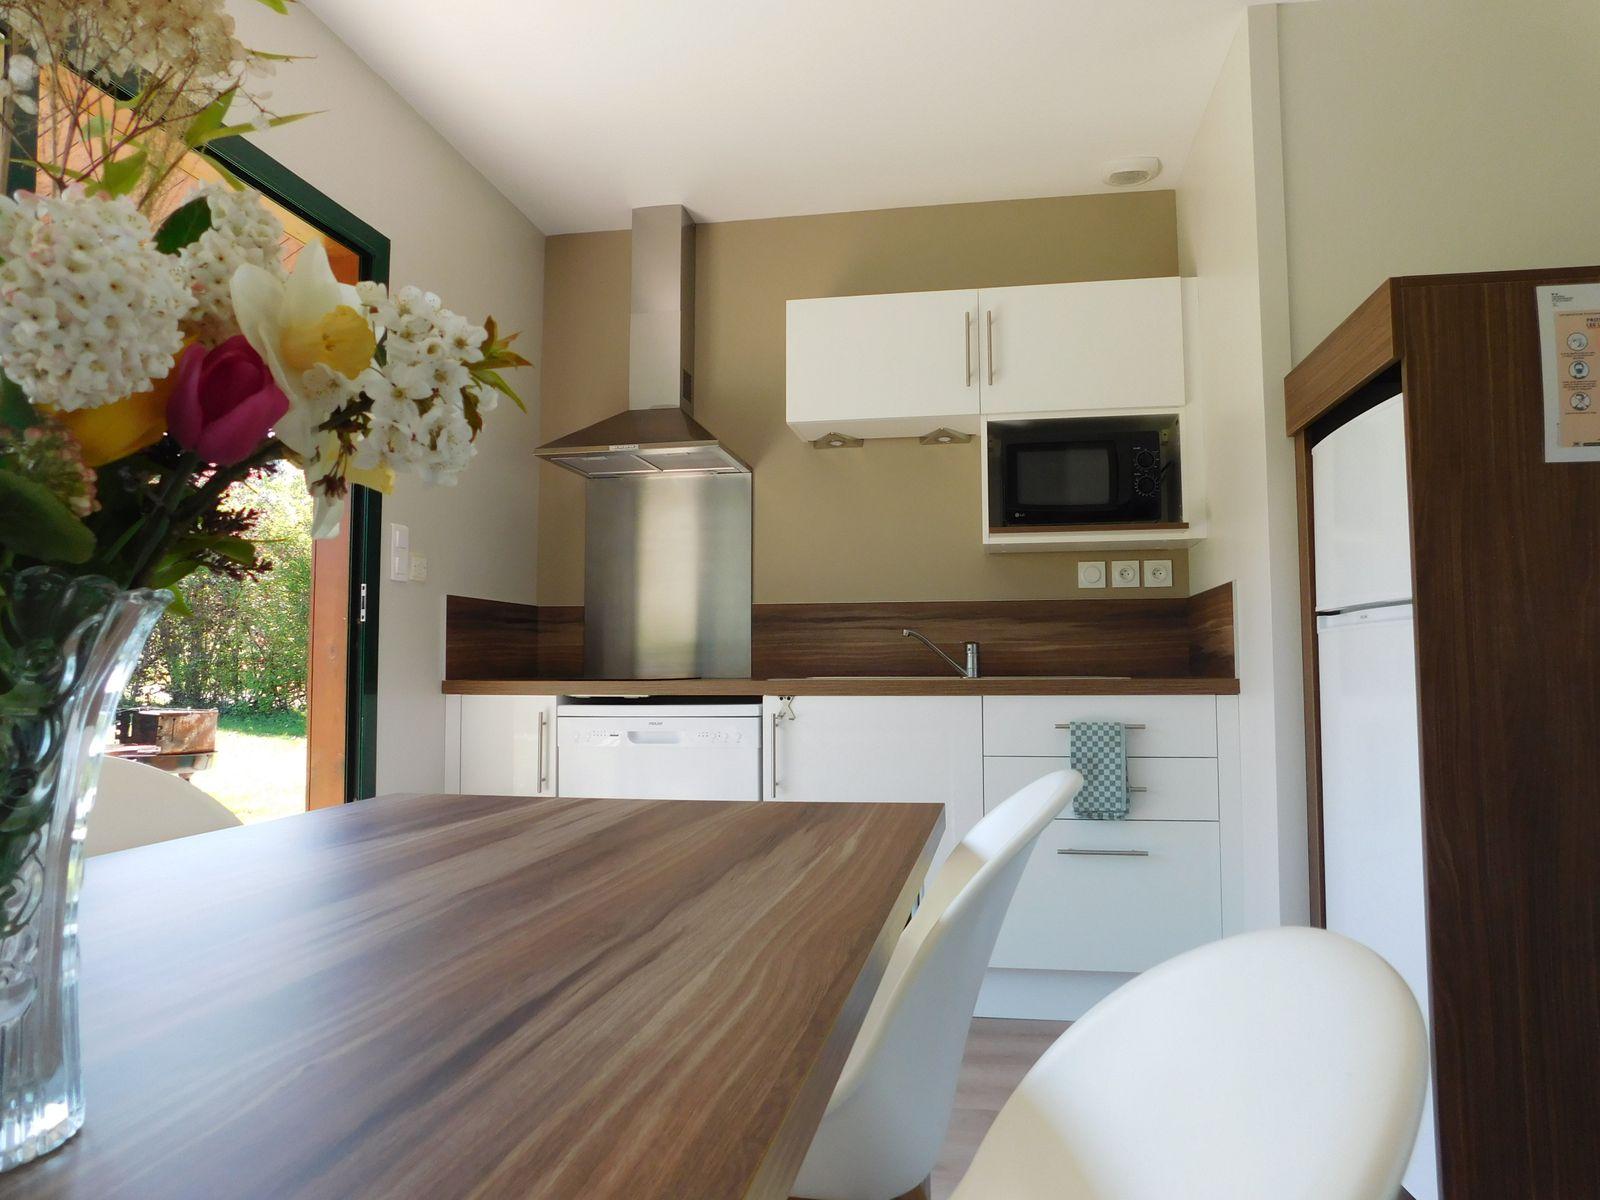 Cuisine et espace dinatoire